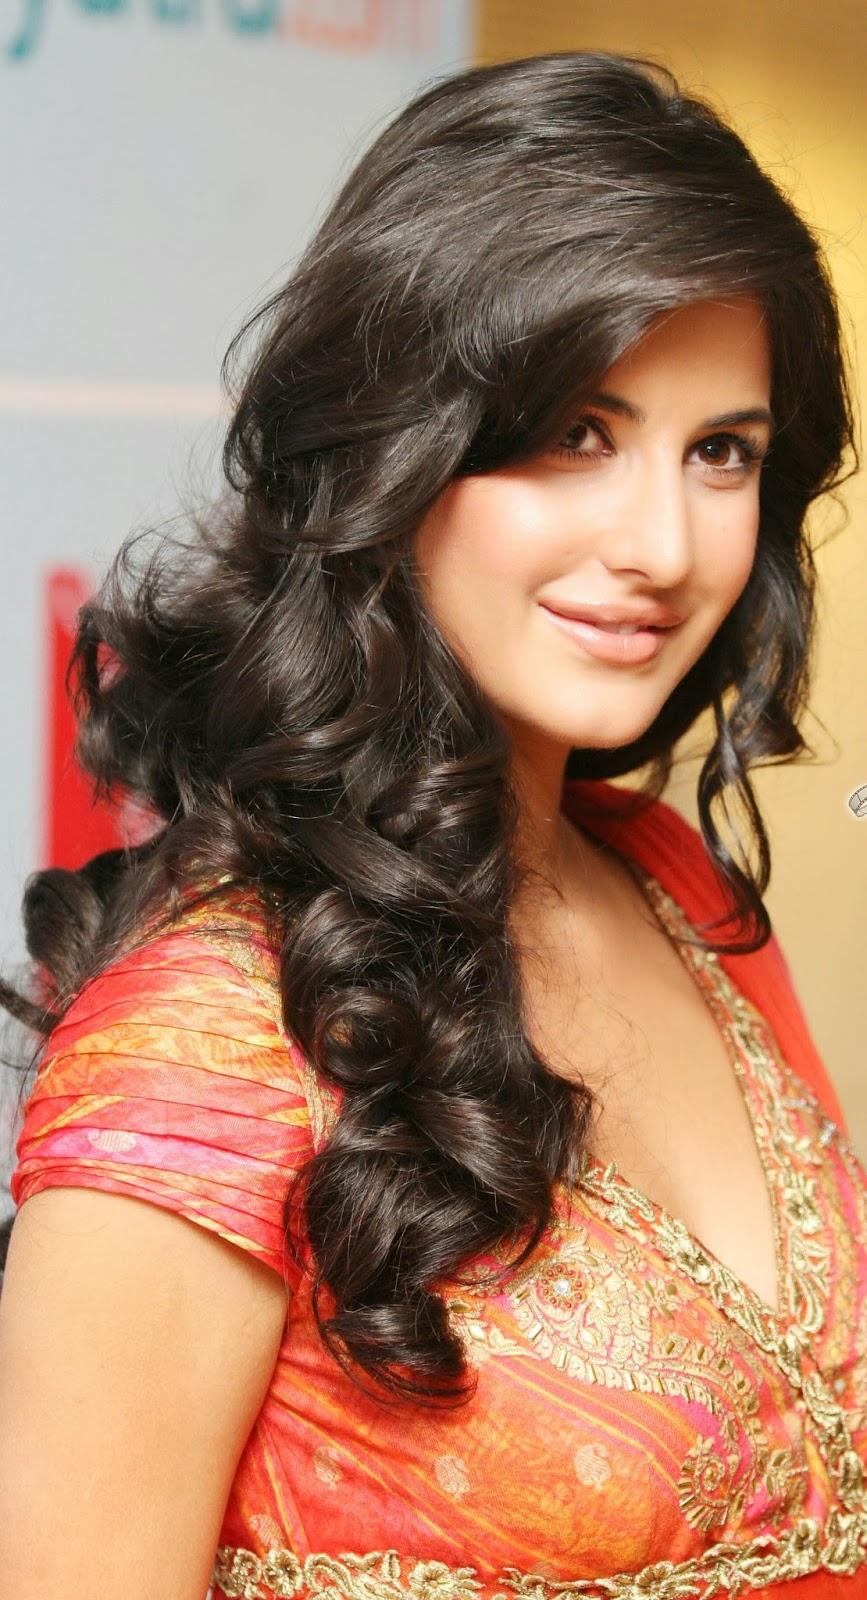 hd wallpapers: Katrina Kaif latest hot pictures, Katrina ...